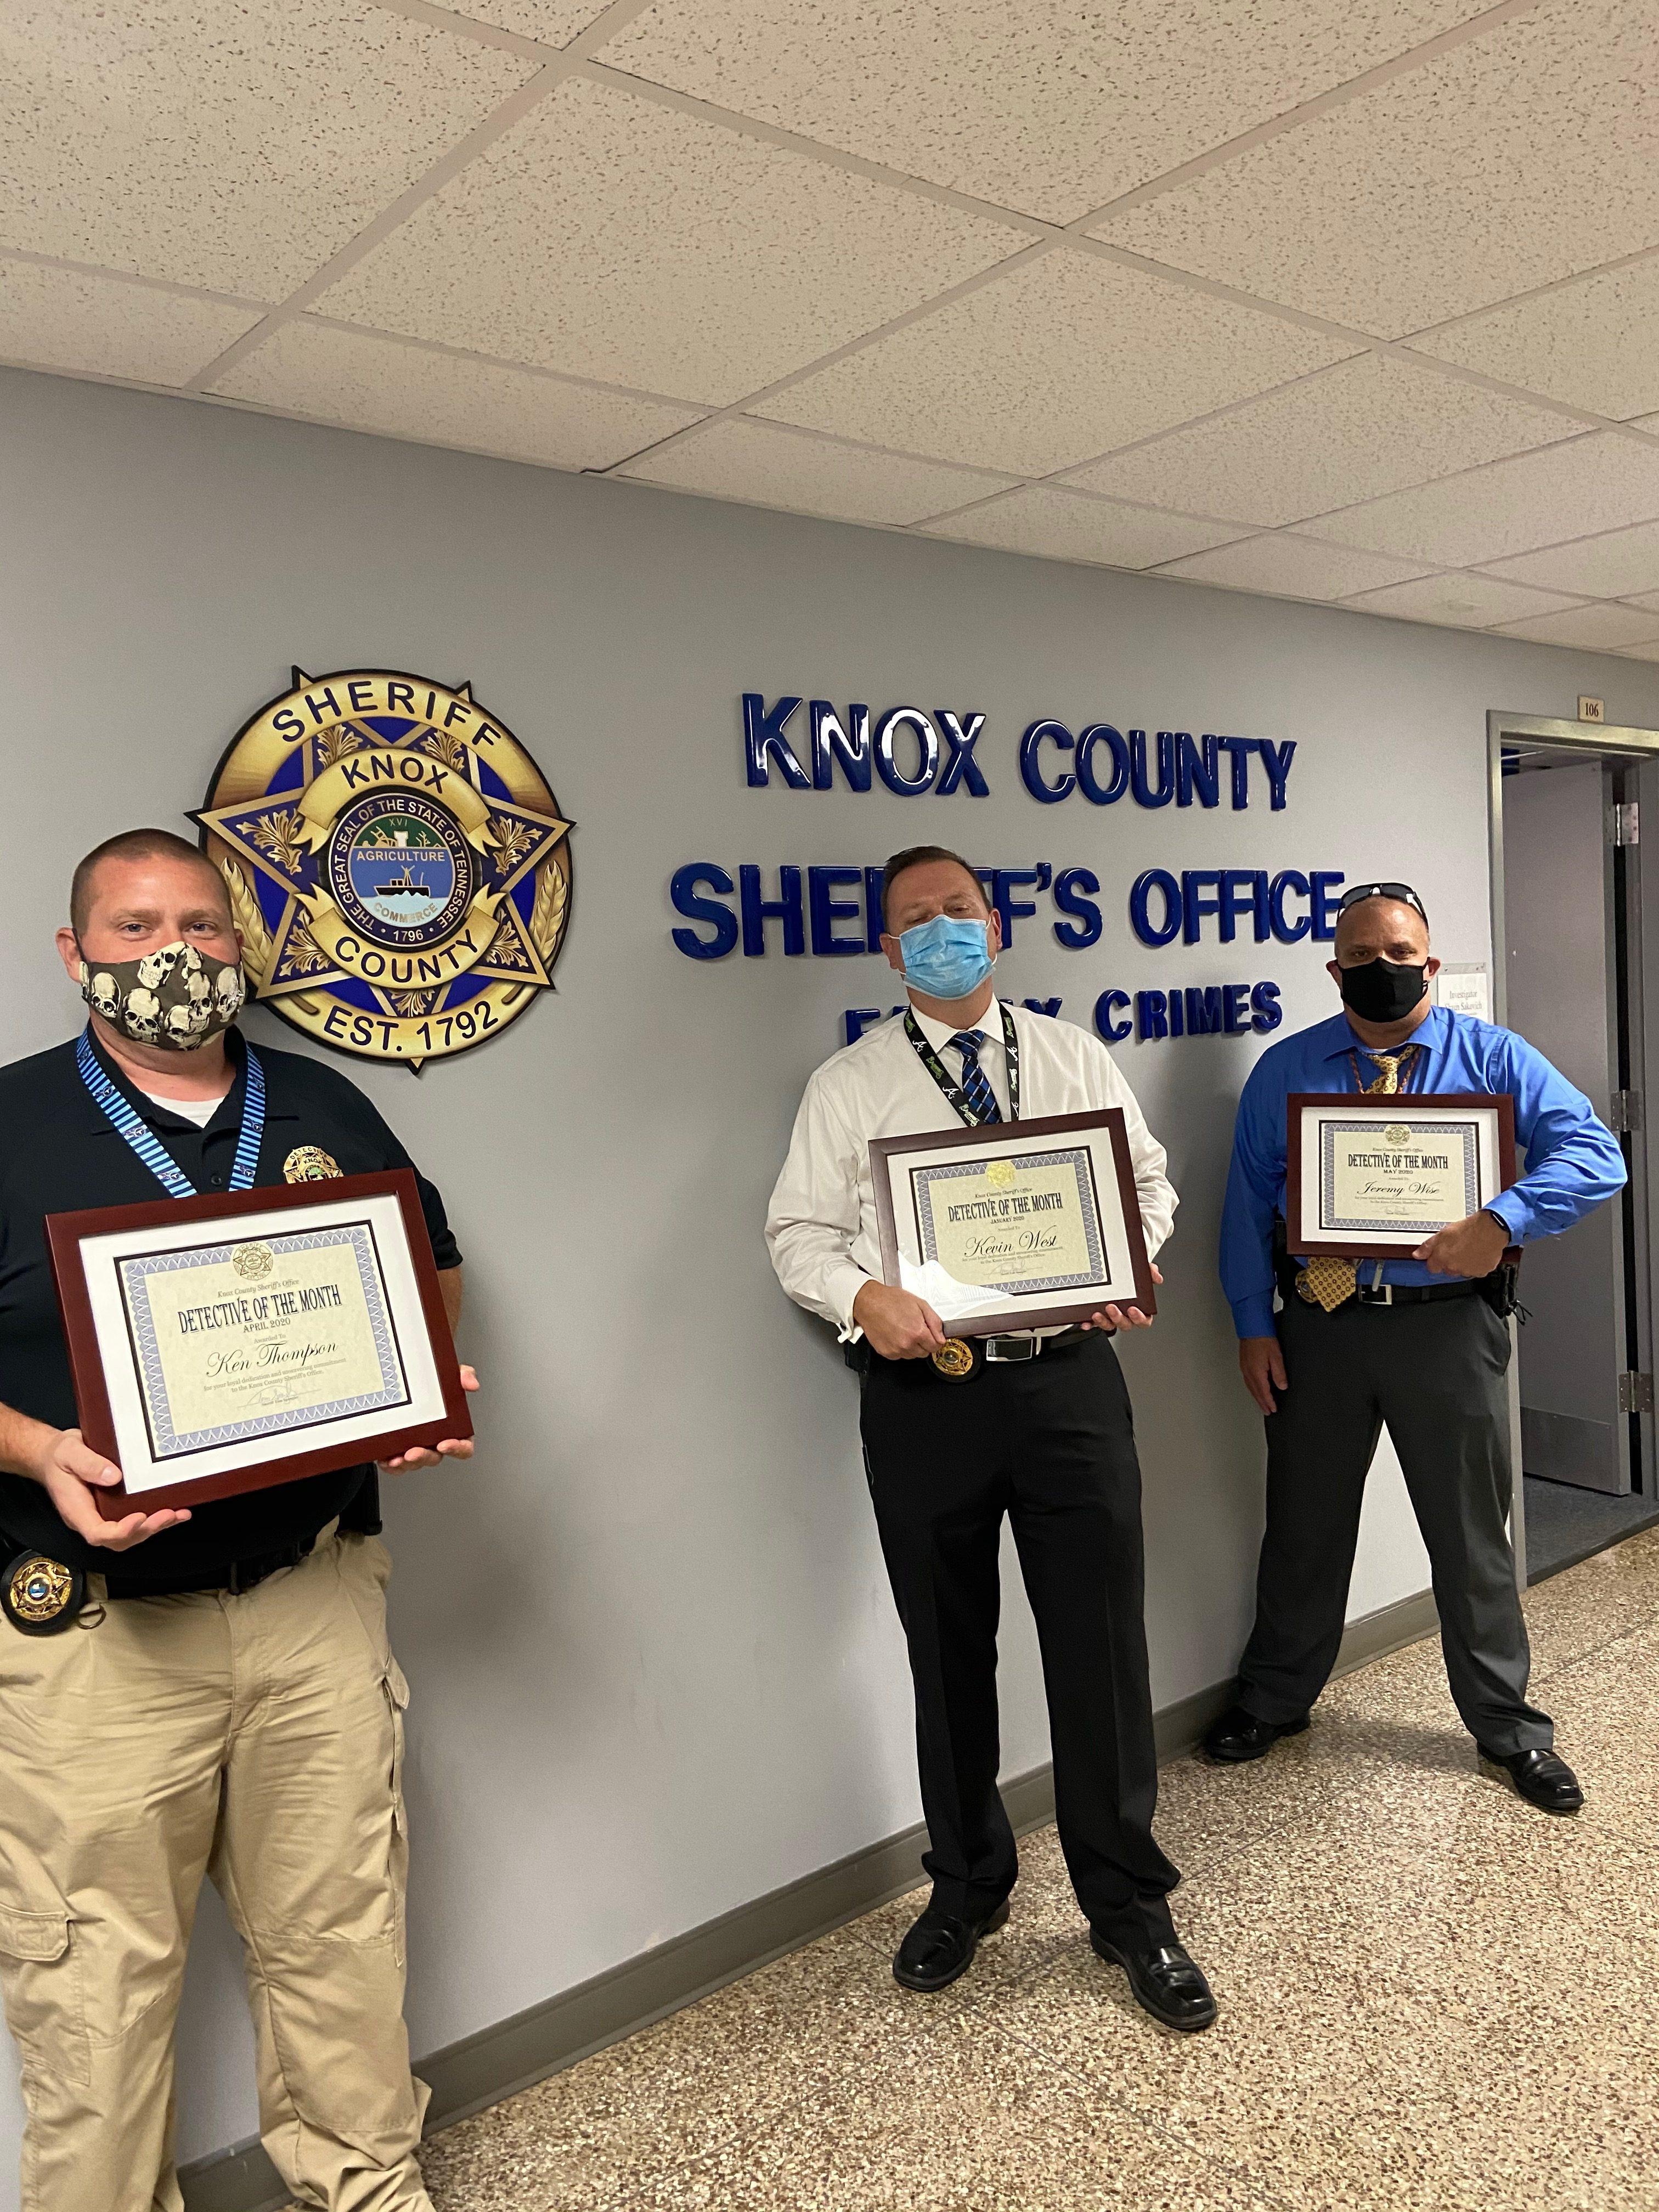 3 KCSO detectives holding awards